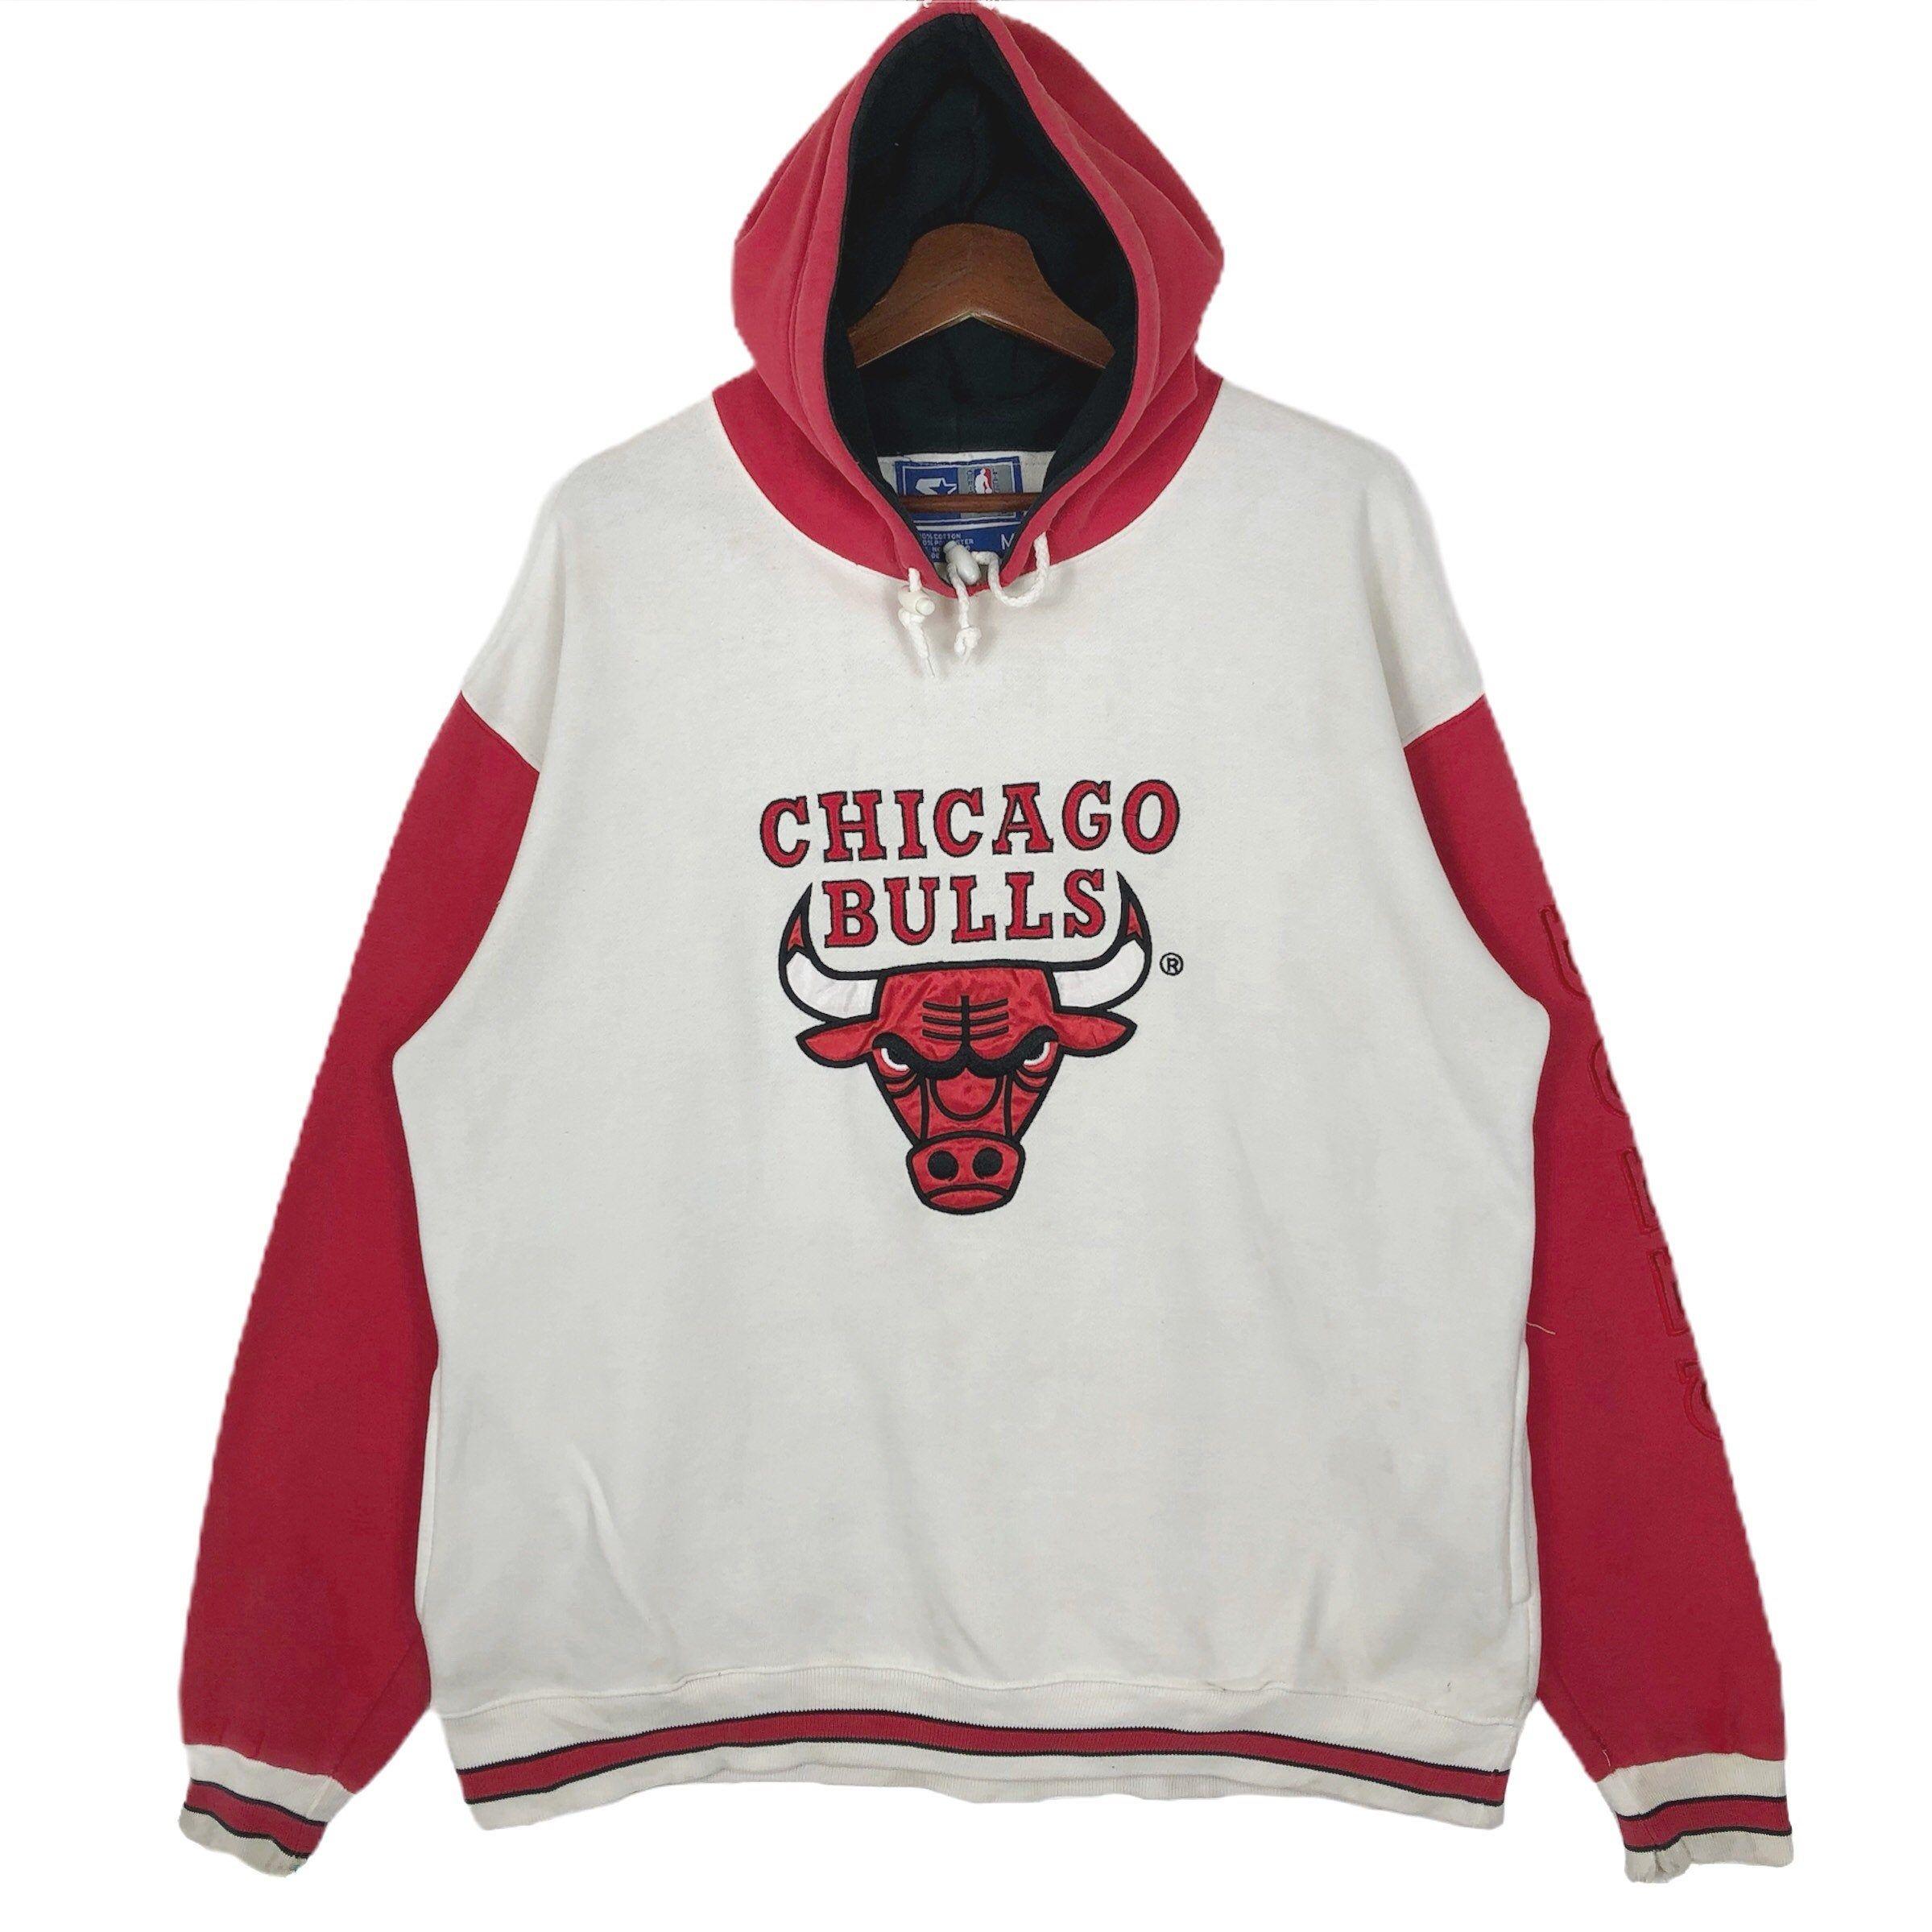 Vintage Nba Chicago Bulls Hoodie By Starter Chicago Bulls Big Logo Embroidery Hoodie Sweatshirt Chicago Bulls Hoodie Sweatshirts Hoodie Vintage Nike Sweatshirt [ 2399 x 2399 Pixel ]